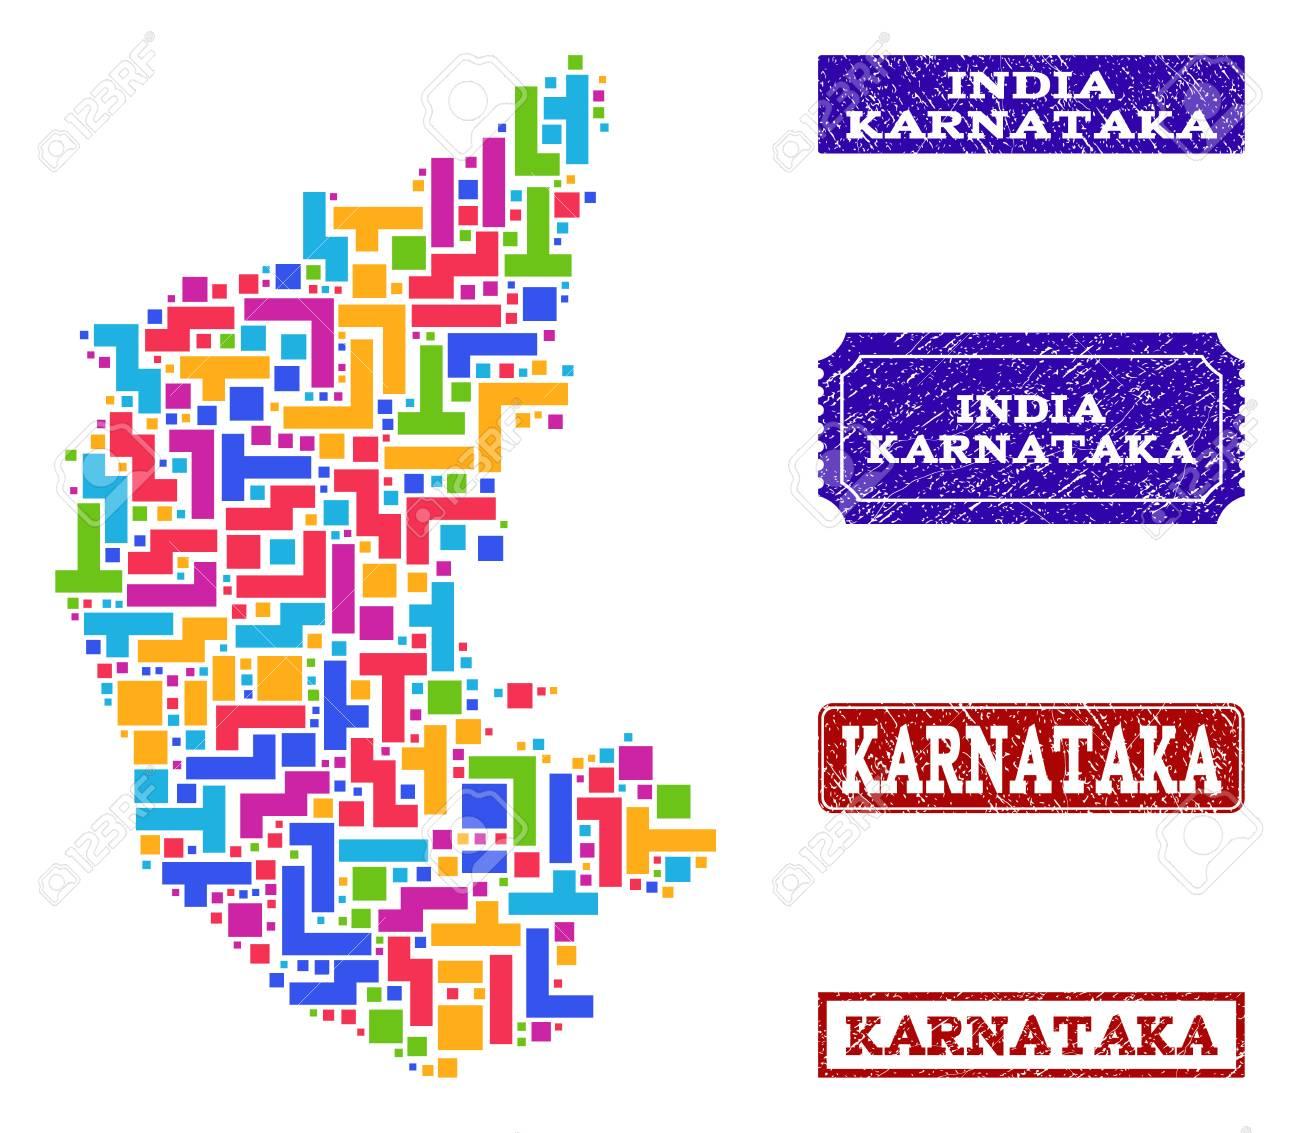 Map Of Karnataka State on map of delhi, map of rajasthan, map of haryana, map of bangalore, map of kashmir, map of mysore, map of yunnan province, map of hubei province, map of gujarat, map of andhra pradesh, map of orissa, map of nunatsiavut, map of mumbai, map of uttar pradesh, map of maharashtra, map of arunachal pradesh, map of india, map of west bengal, map of kerala, map of madhya pradesh,